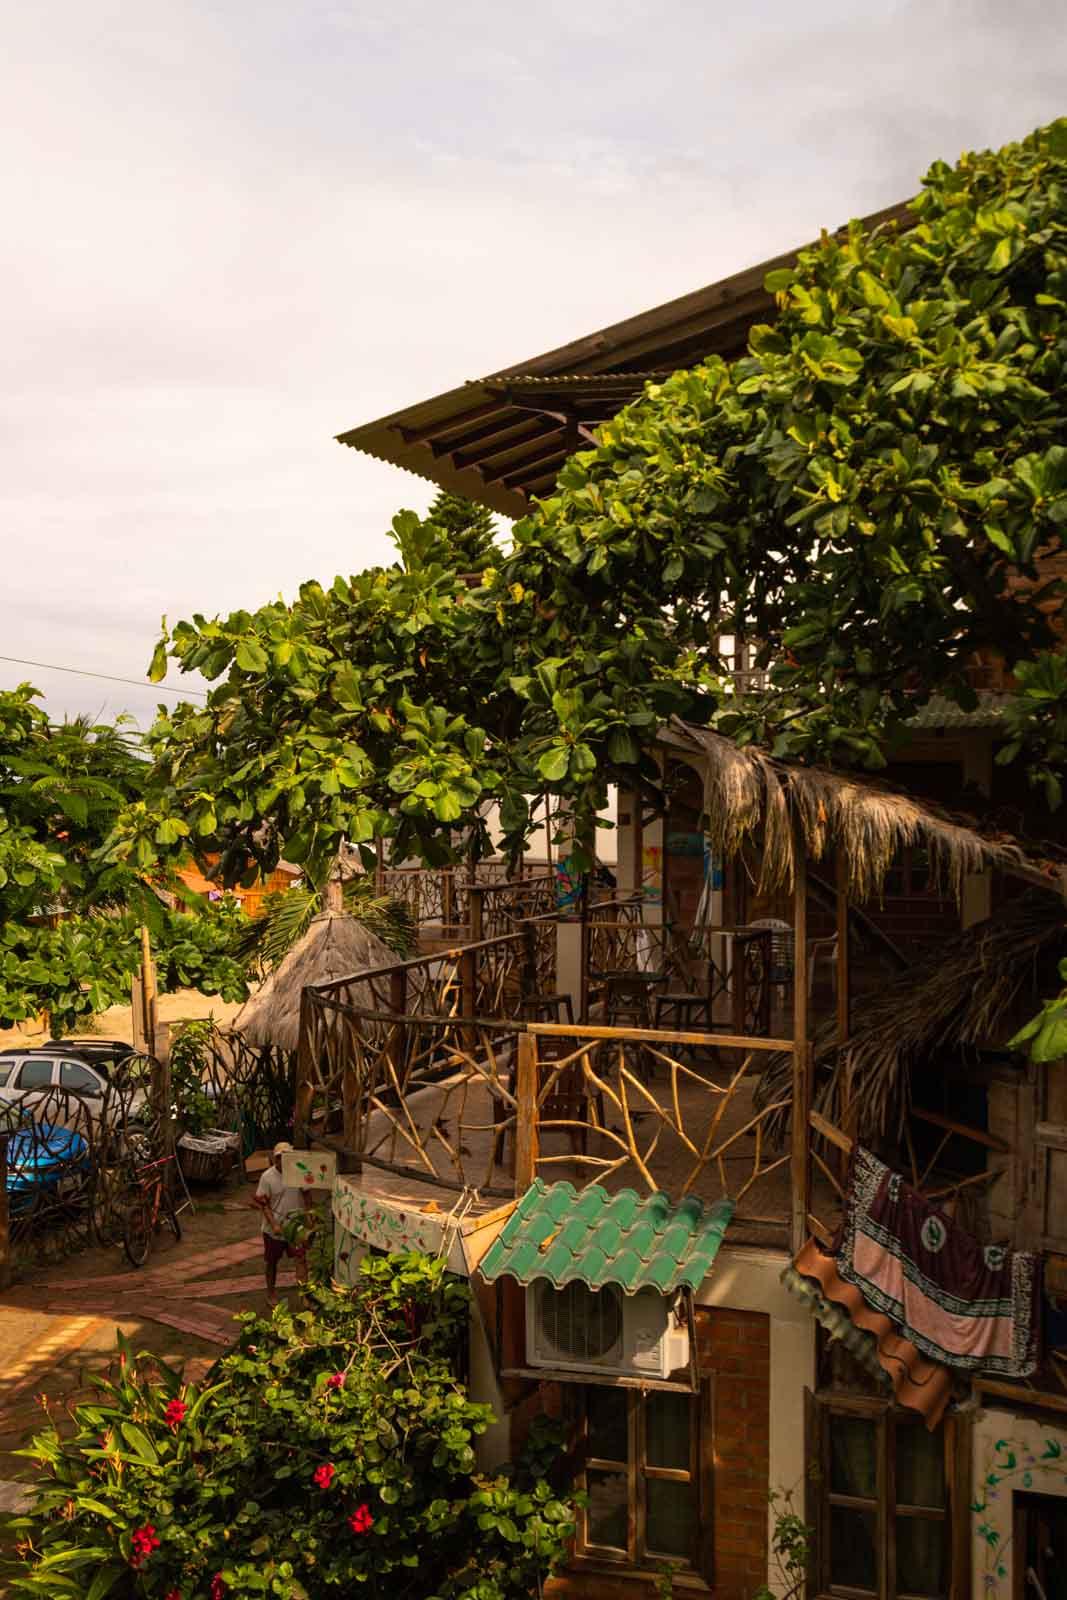 We stayed at Olon Sea Garden Hotel for a little bit when we were visiting Olon, Ecuador.